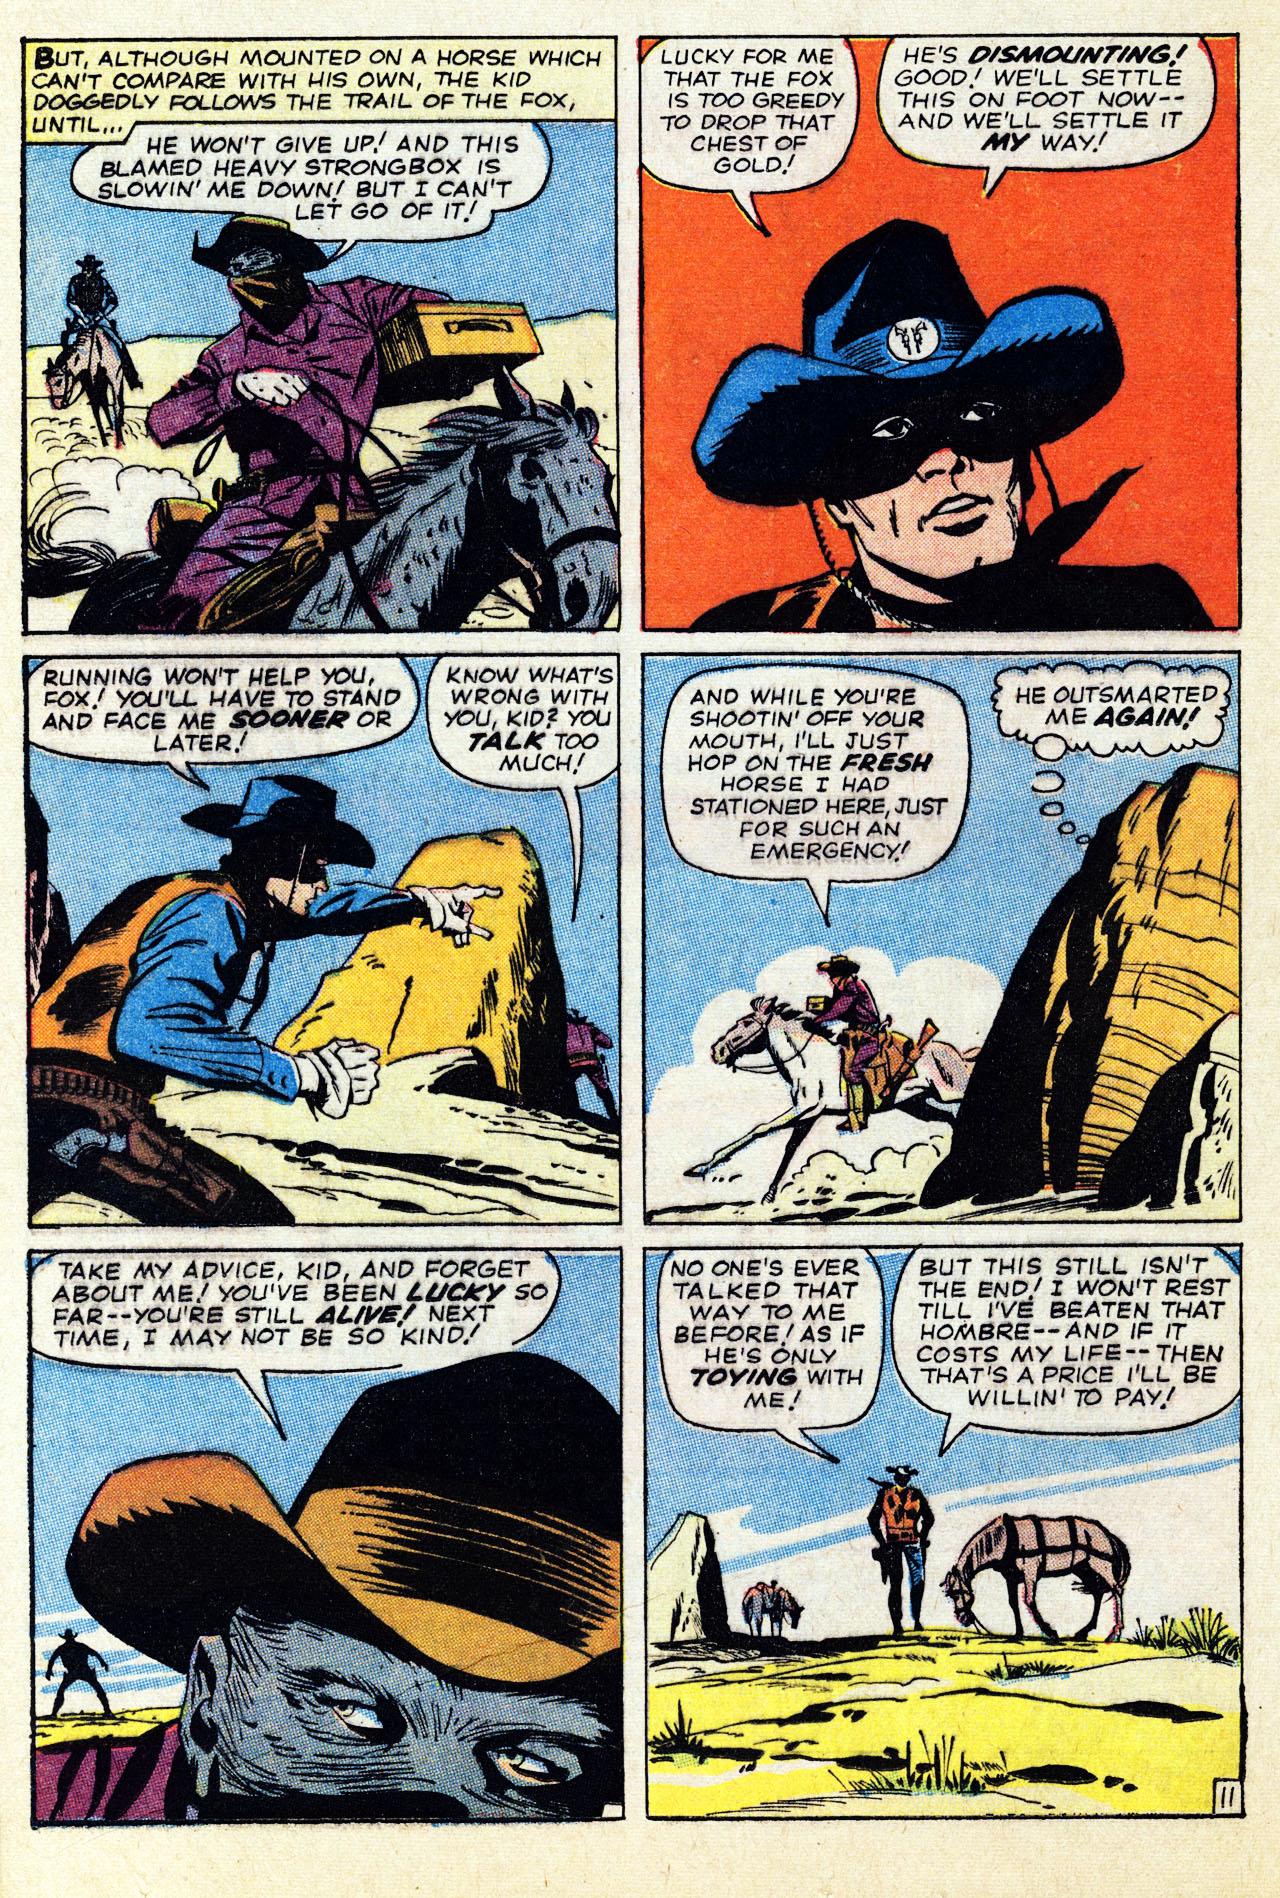 Read online Two-Gun Kid comic -  Issue #67 - 16